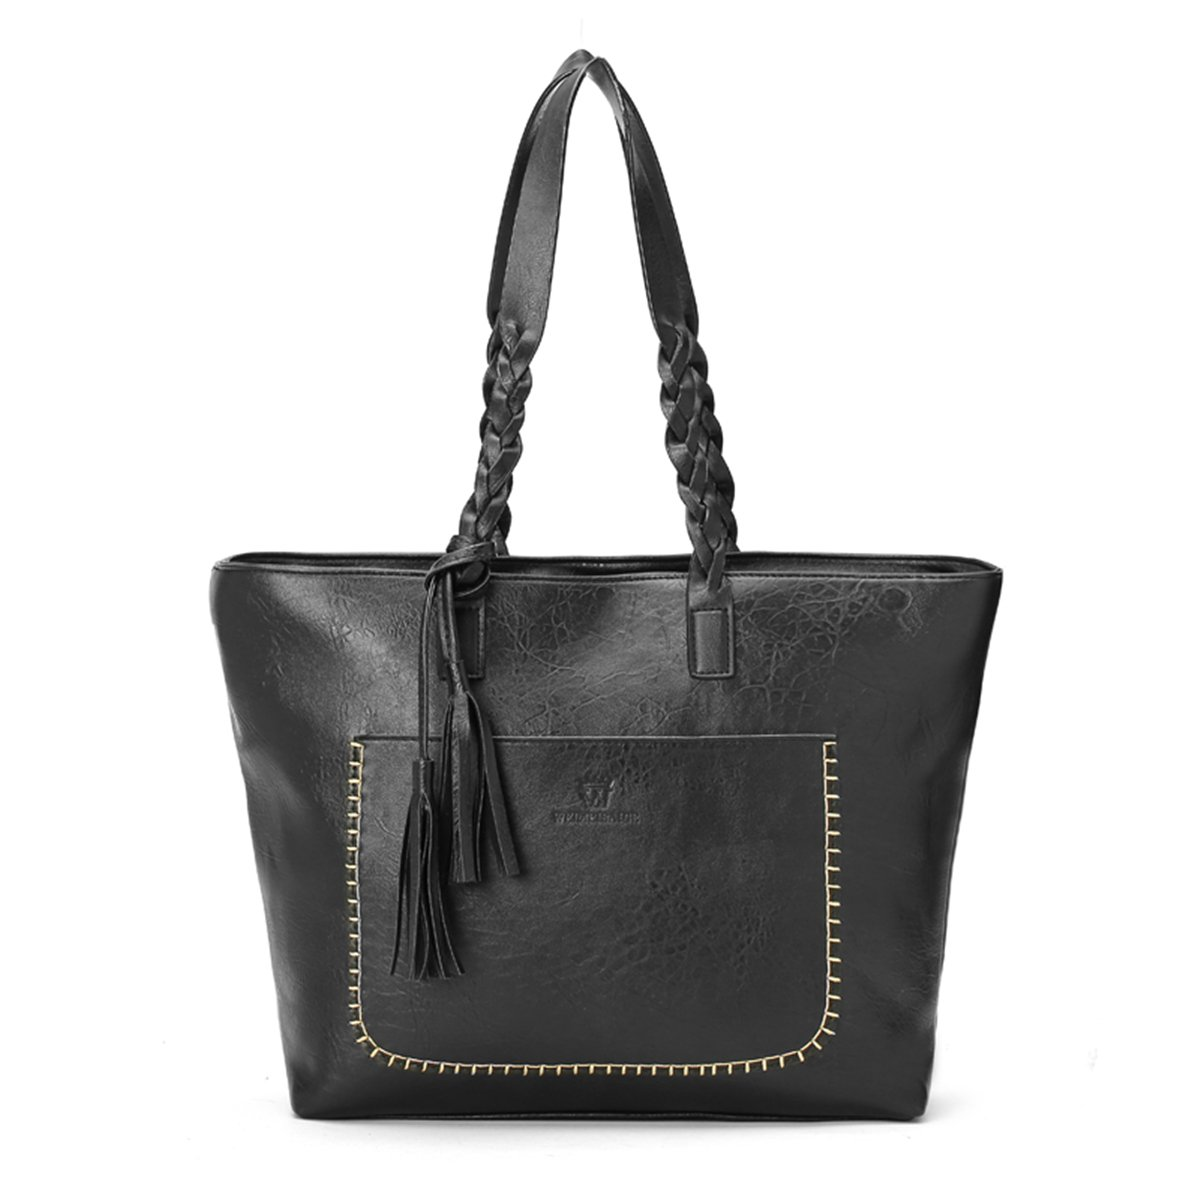 Aequeen Women Vintage PU Leather Tote Shoulder Bag Handbag Big Large Capacity Black Medium